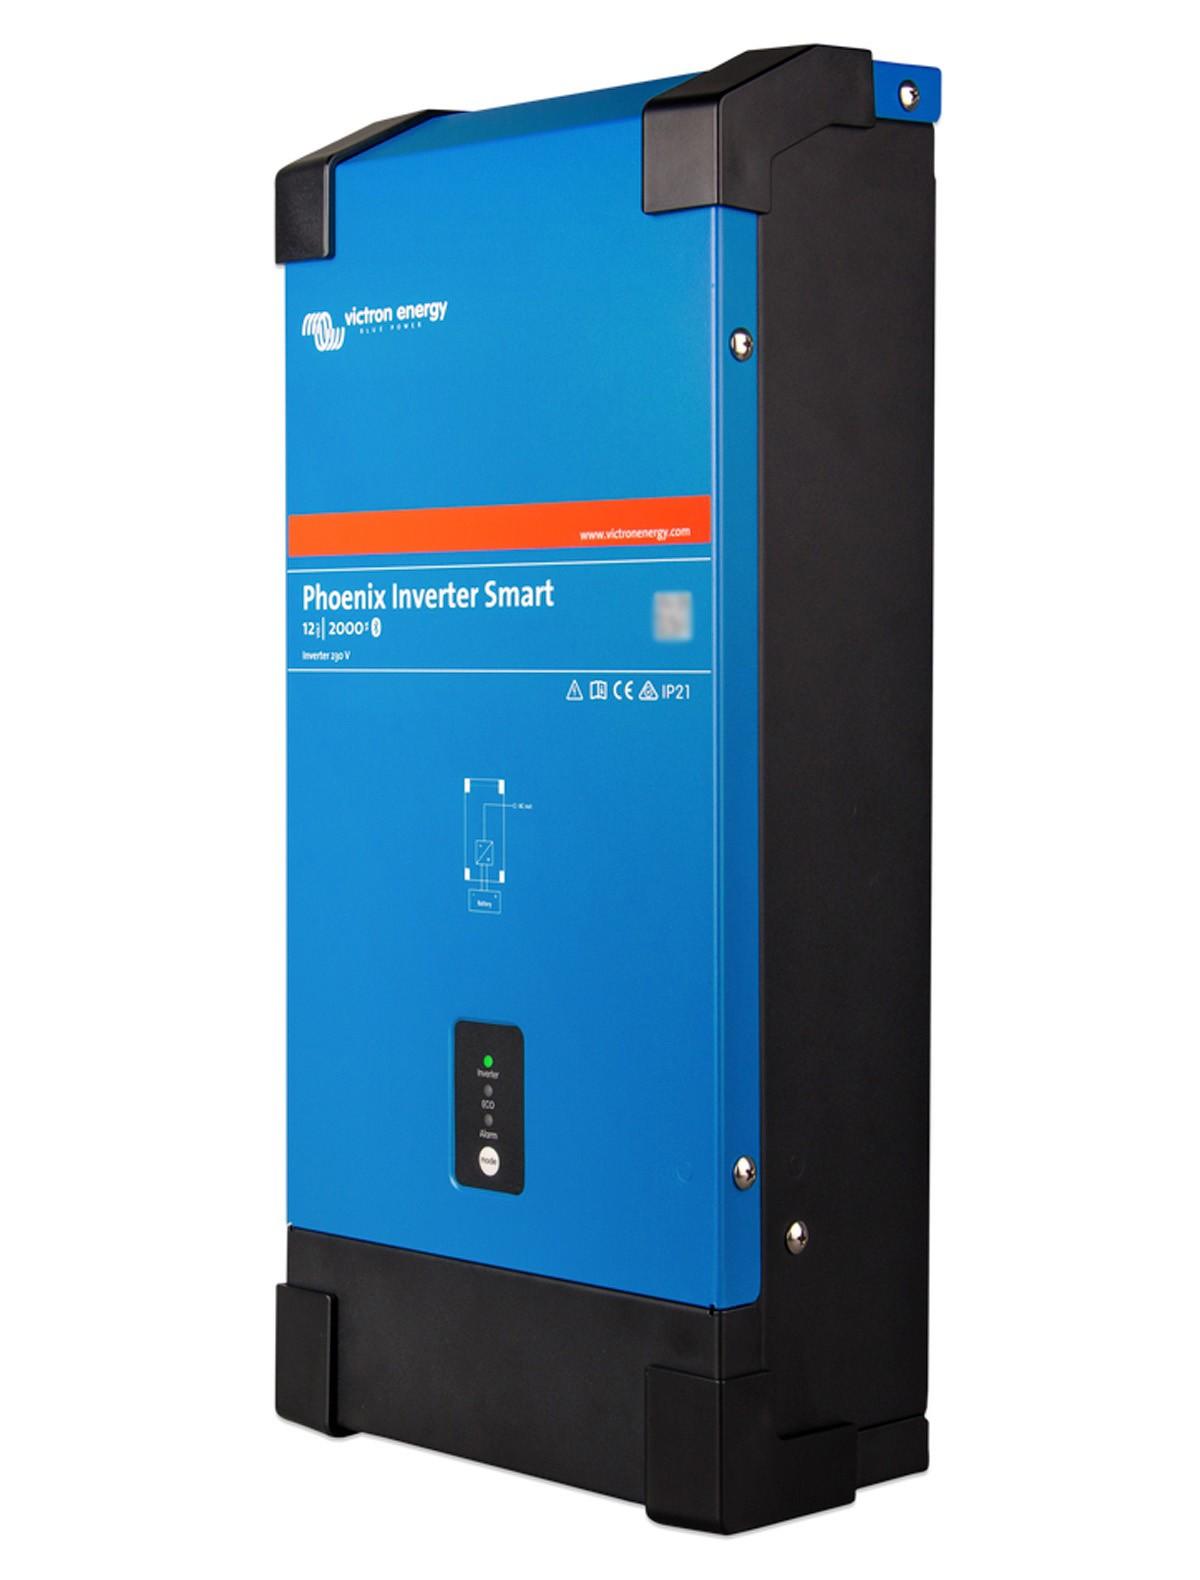 Inversor de Corrente Victron 2000VA 12Vcc para 230Vca Senoidal Pura Bluetooth Phoenix Smart p/ Barcos Lanchas